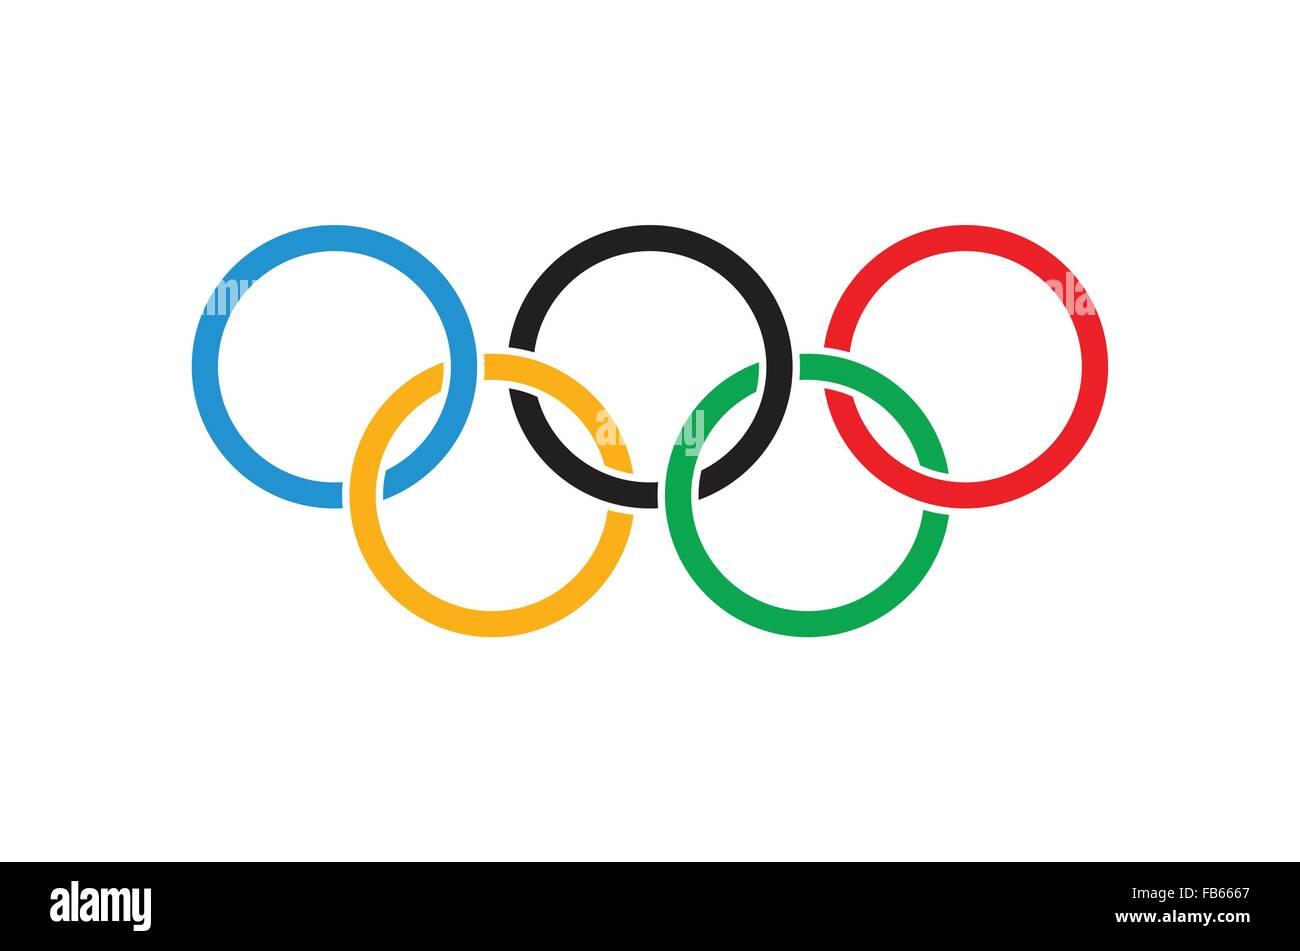 Kremenchug, Ukraine -05 January 2016. Olympics flag. Olympic rings on white colors flag. Vector illustration - Stock Image